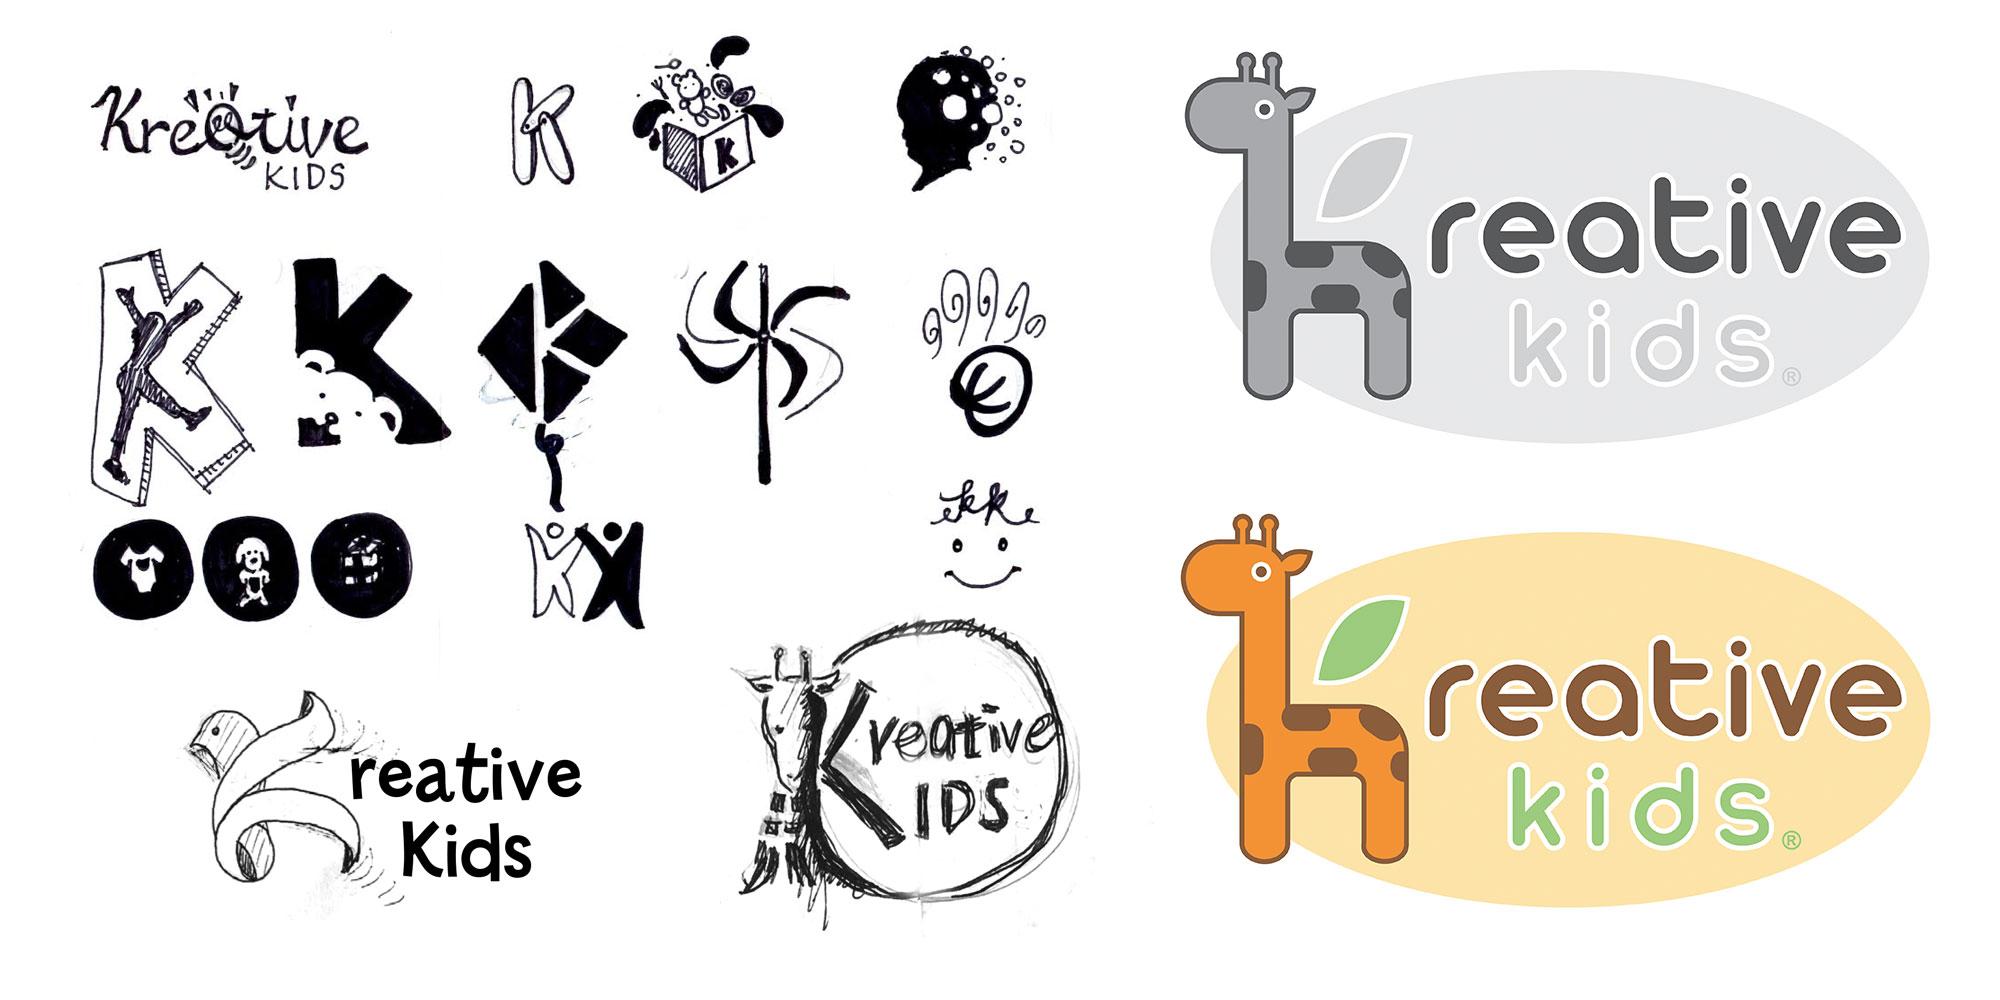 Kreative Kids Logo Design